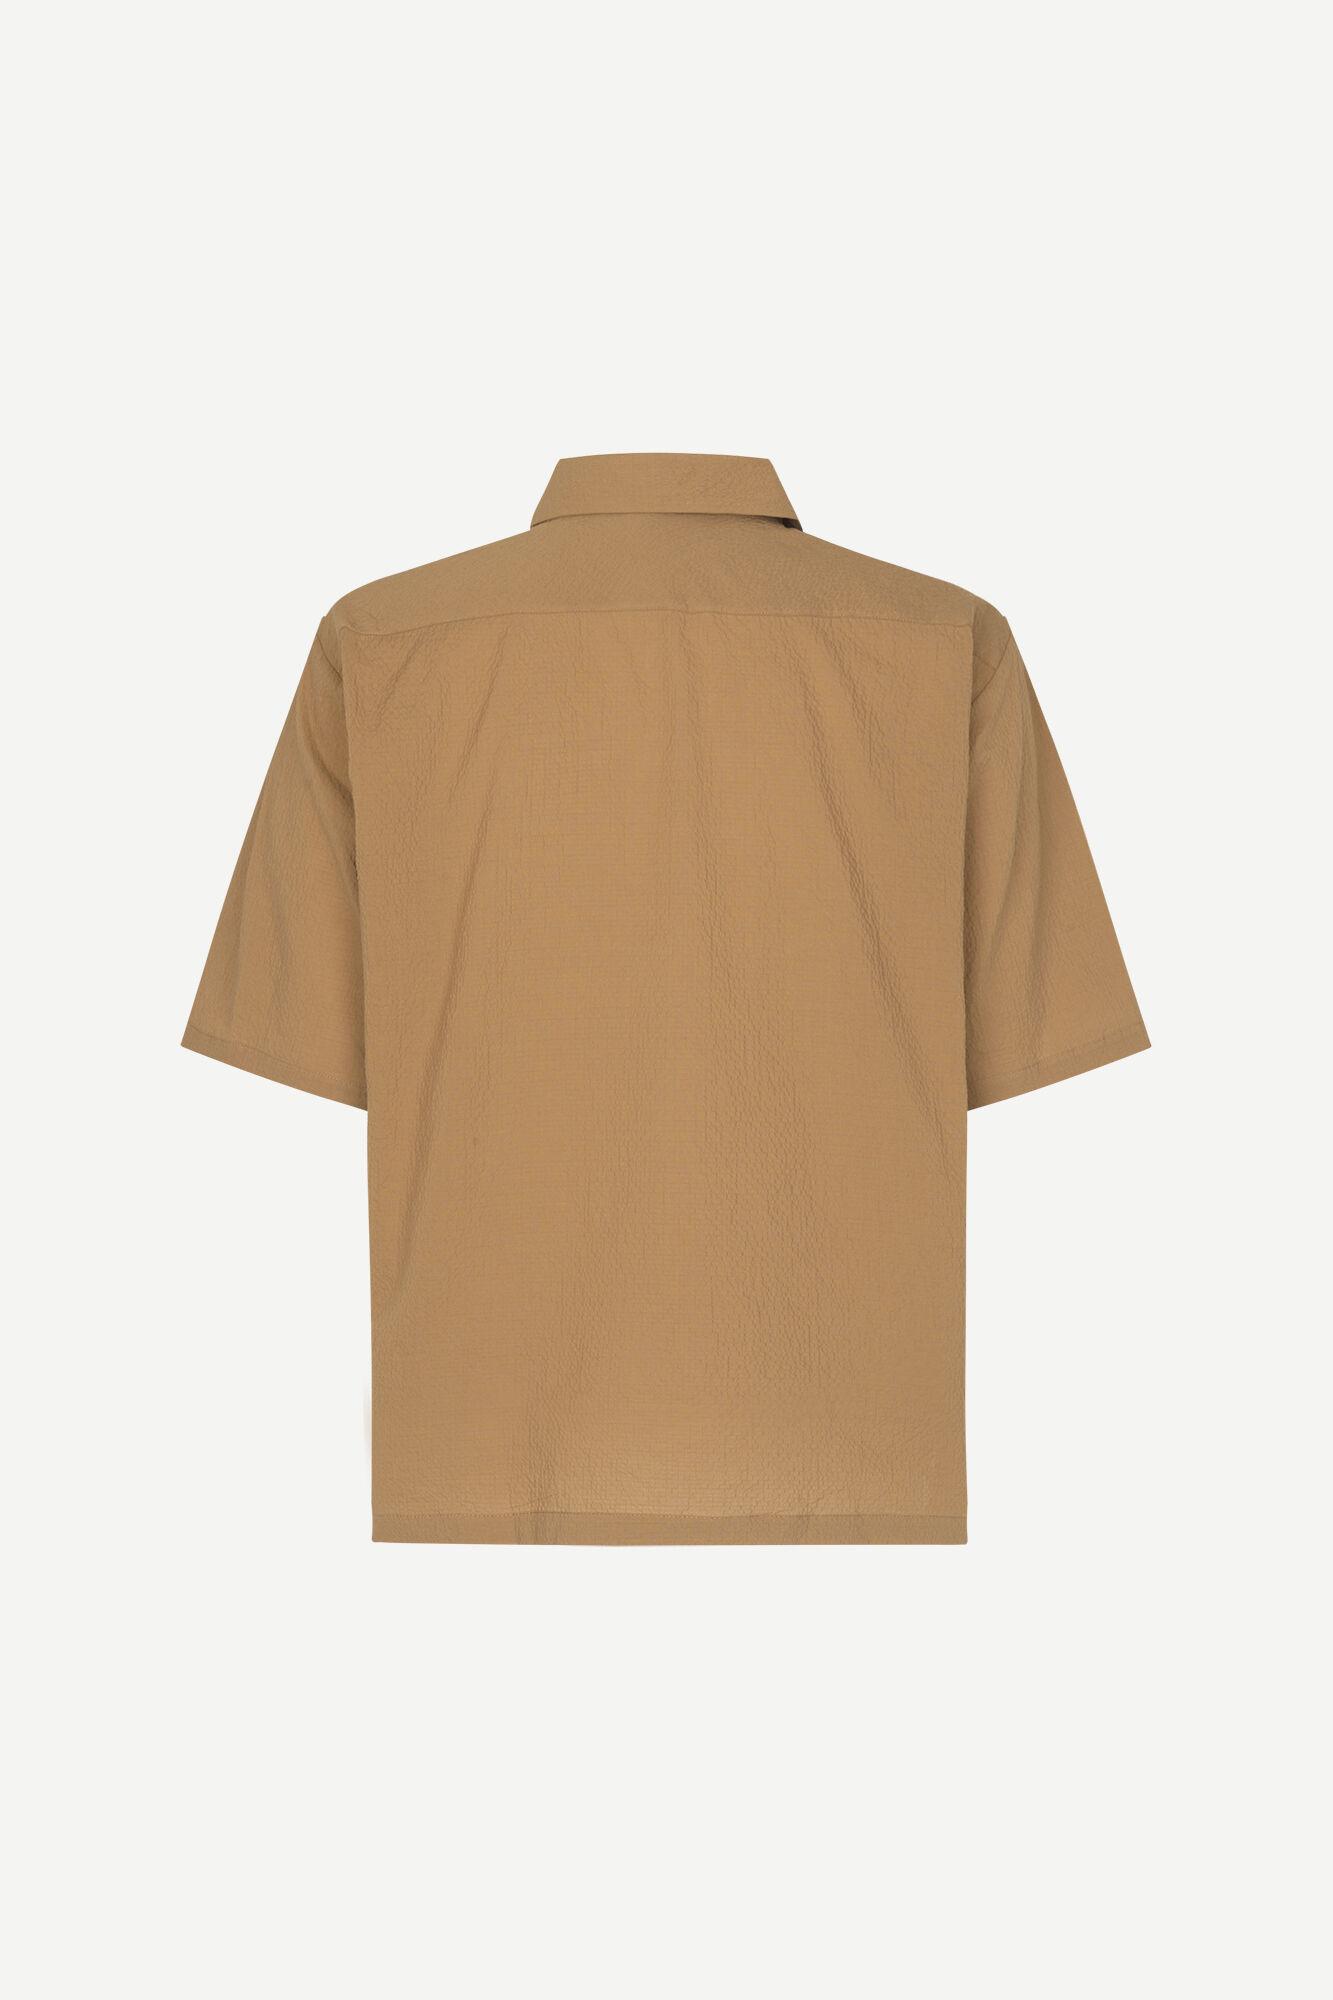 Amare shirt 13070